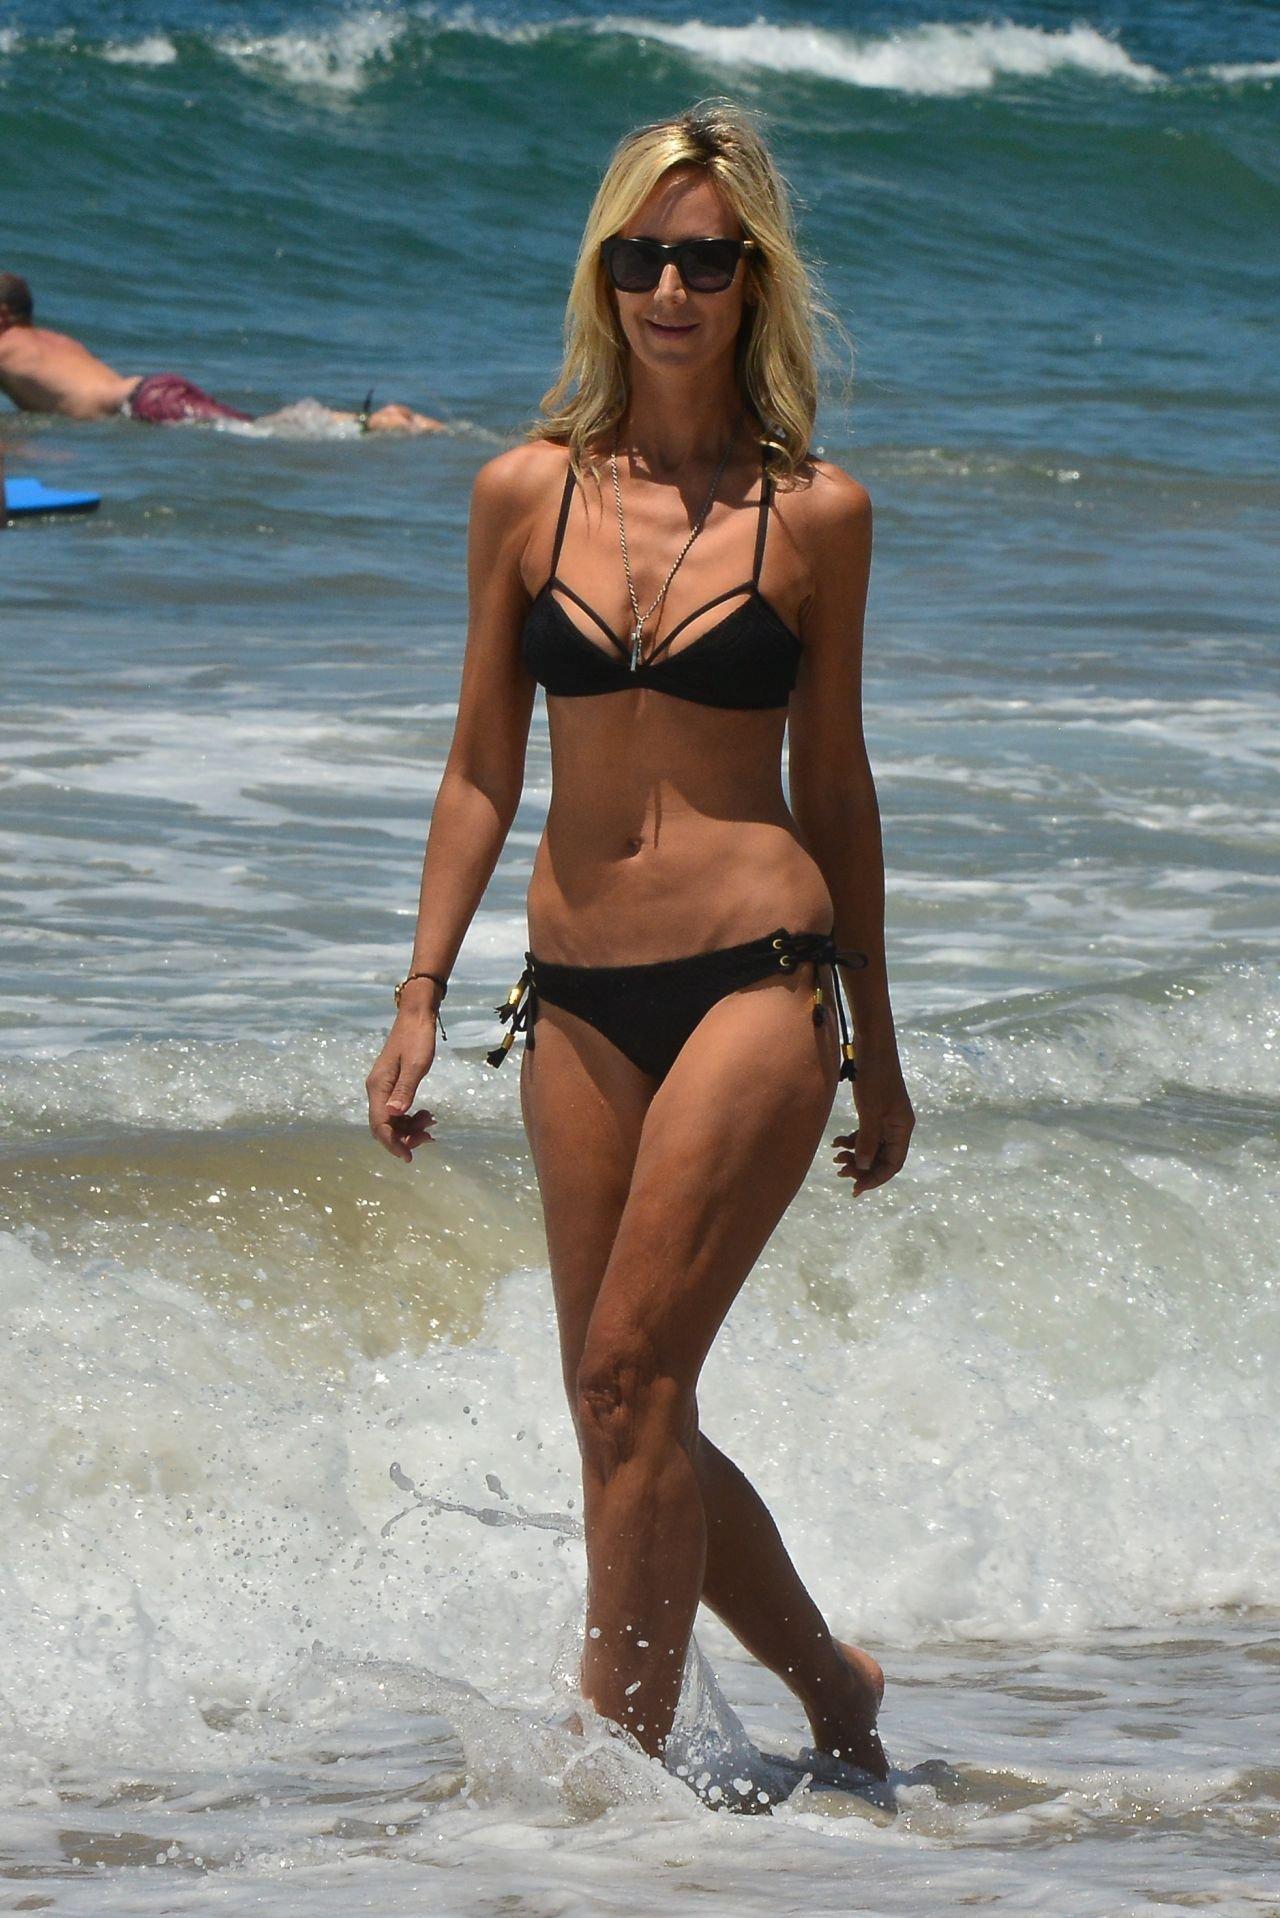 Celebrity Samantha Mumba naked (89 photo), Topless, Hot, Boobs, legs 2006